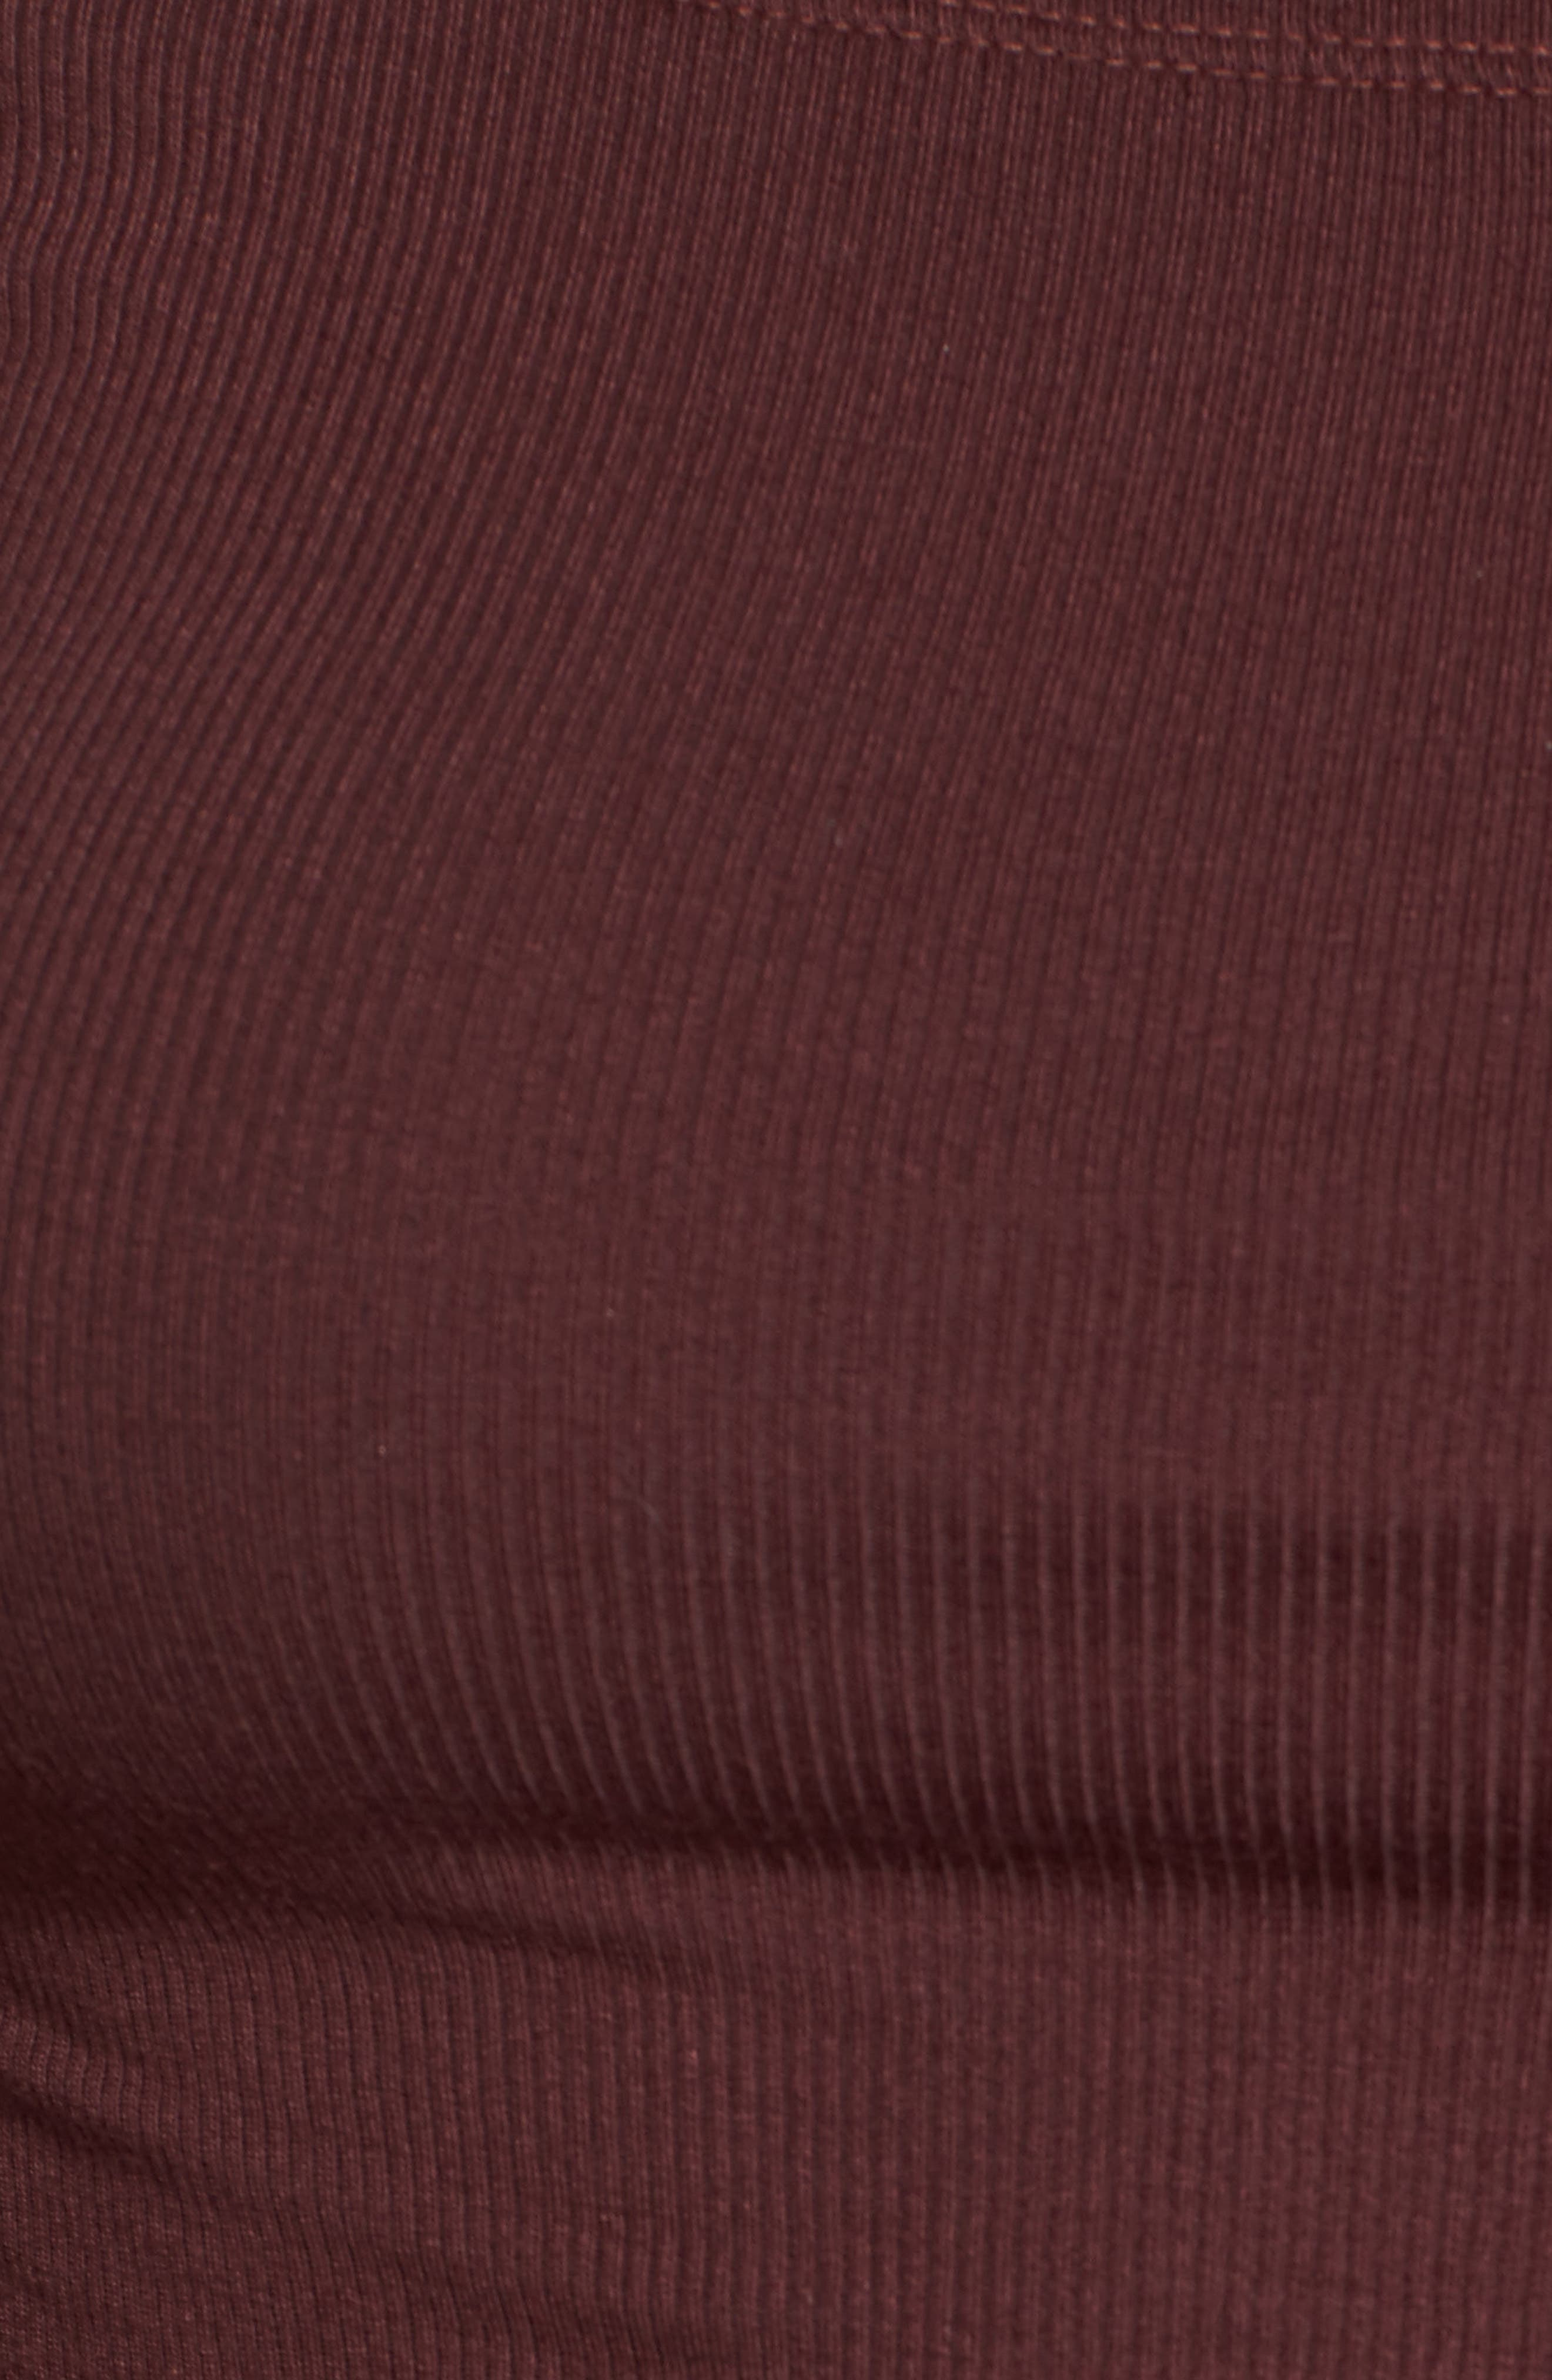 Emery Cutout Tee,                             Alternate thumbnail 5, color,                             Merlot Red